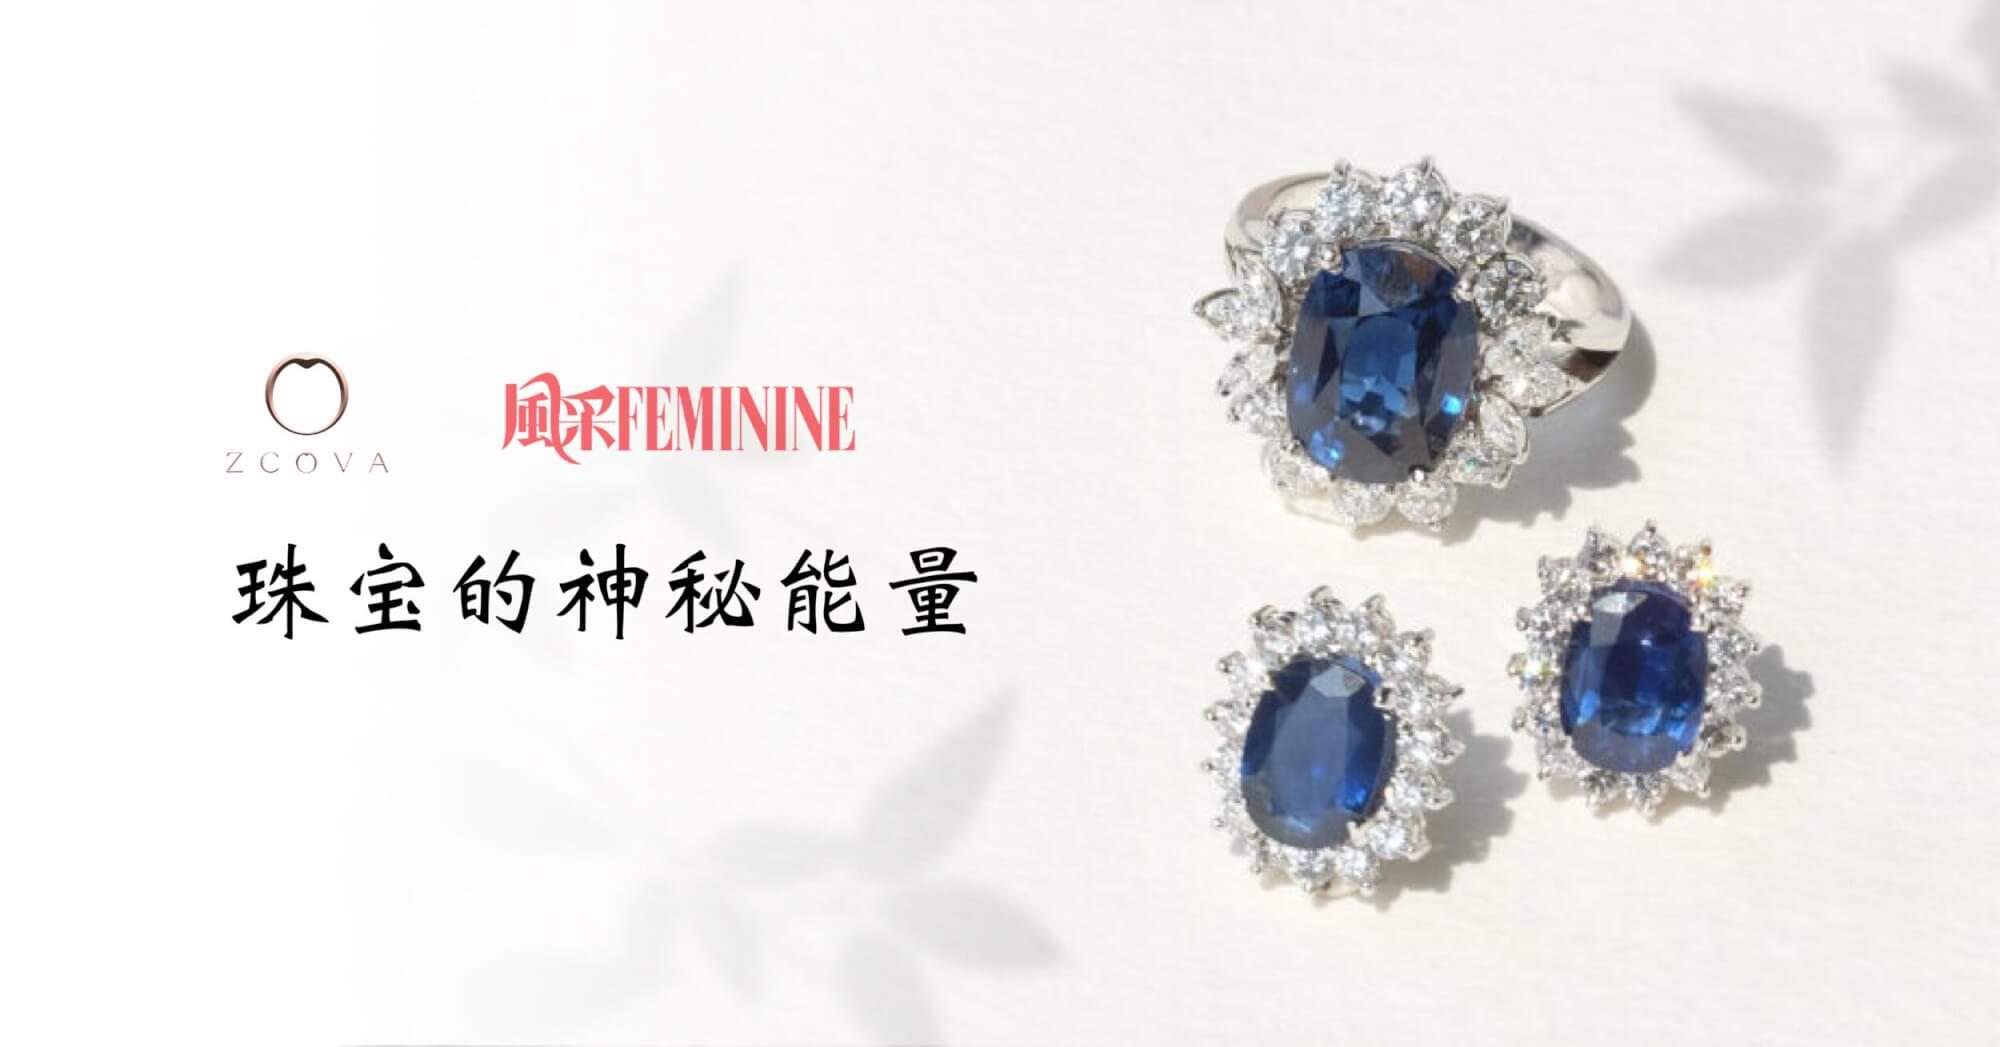 ZCOVA in Feminine Gemstones meaning